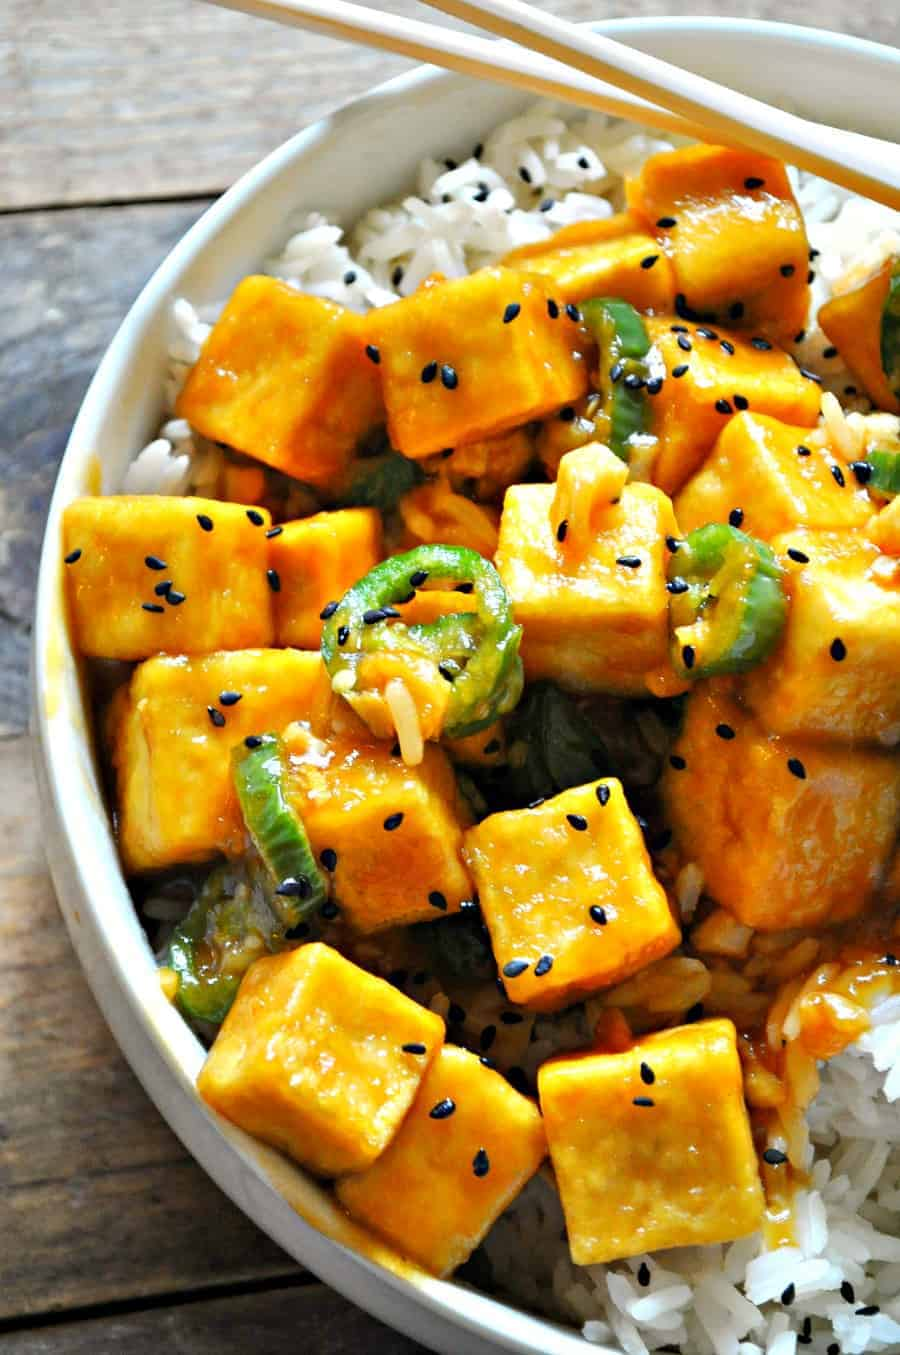 Vegan crispy hawaiian garlic tofu rabbit and wolves this vegan crispy hawaiian garlic tofu has it all sweet spicy salty crispy so easy yet still pretty healthy and refined sugar free forumfinder Image collections